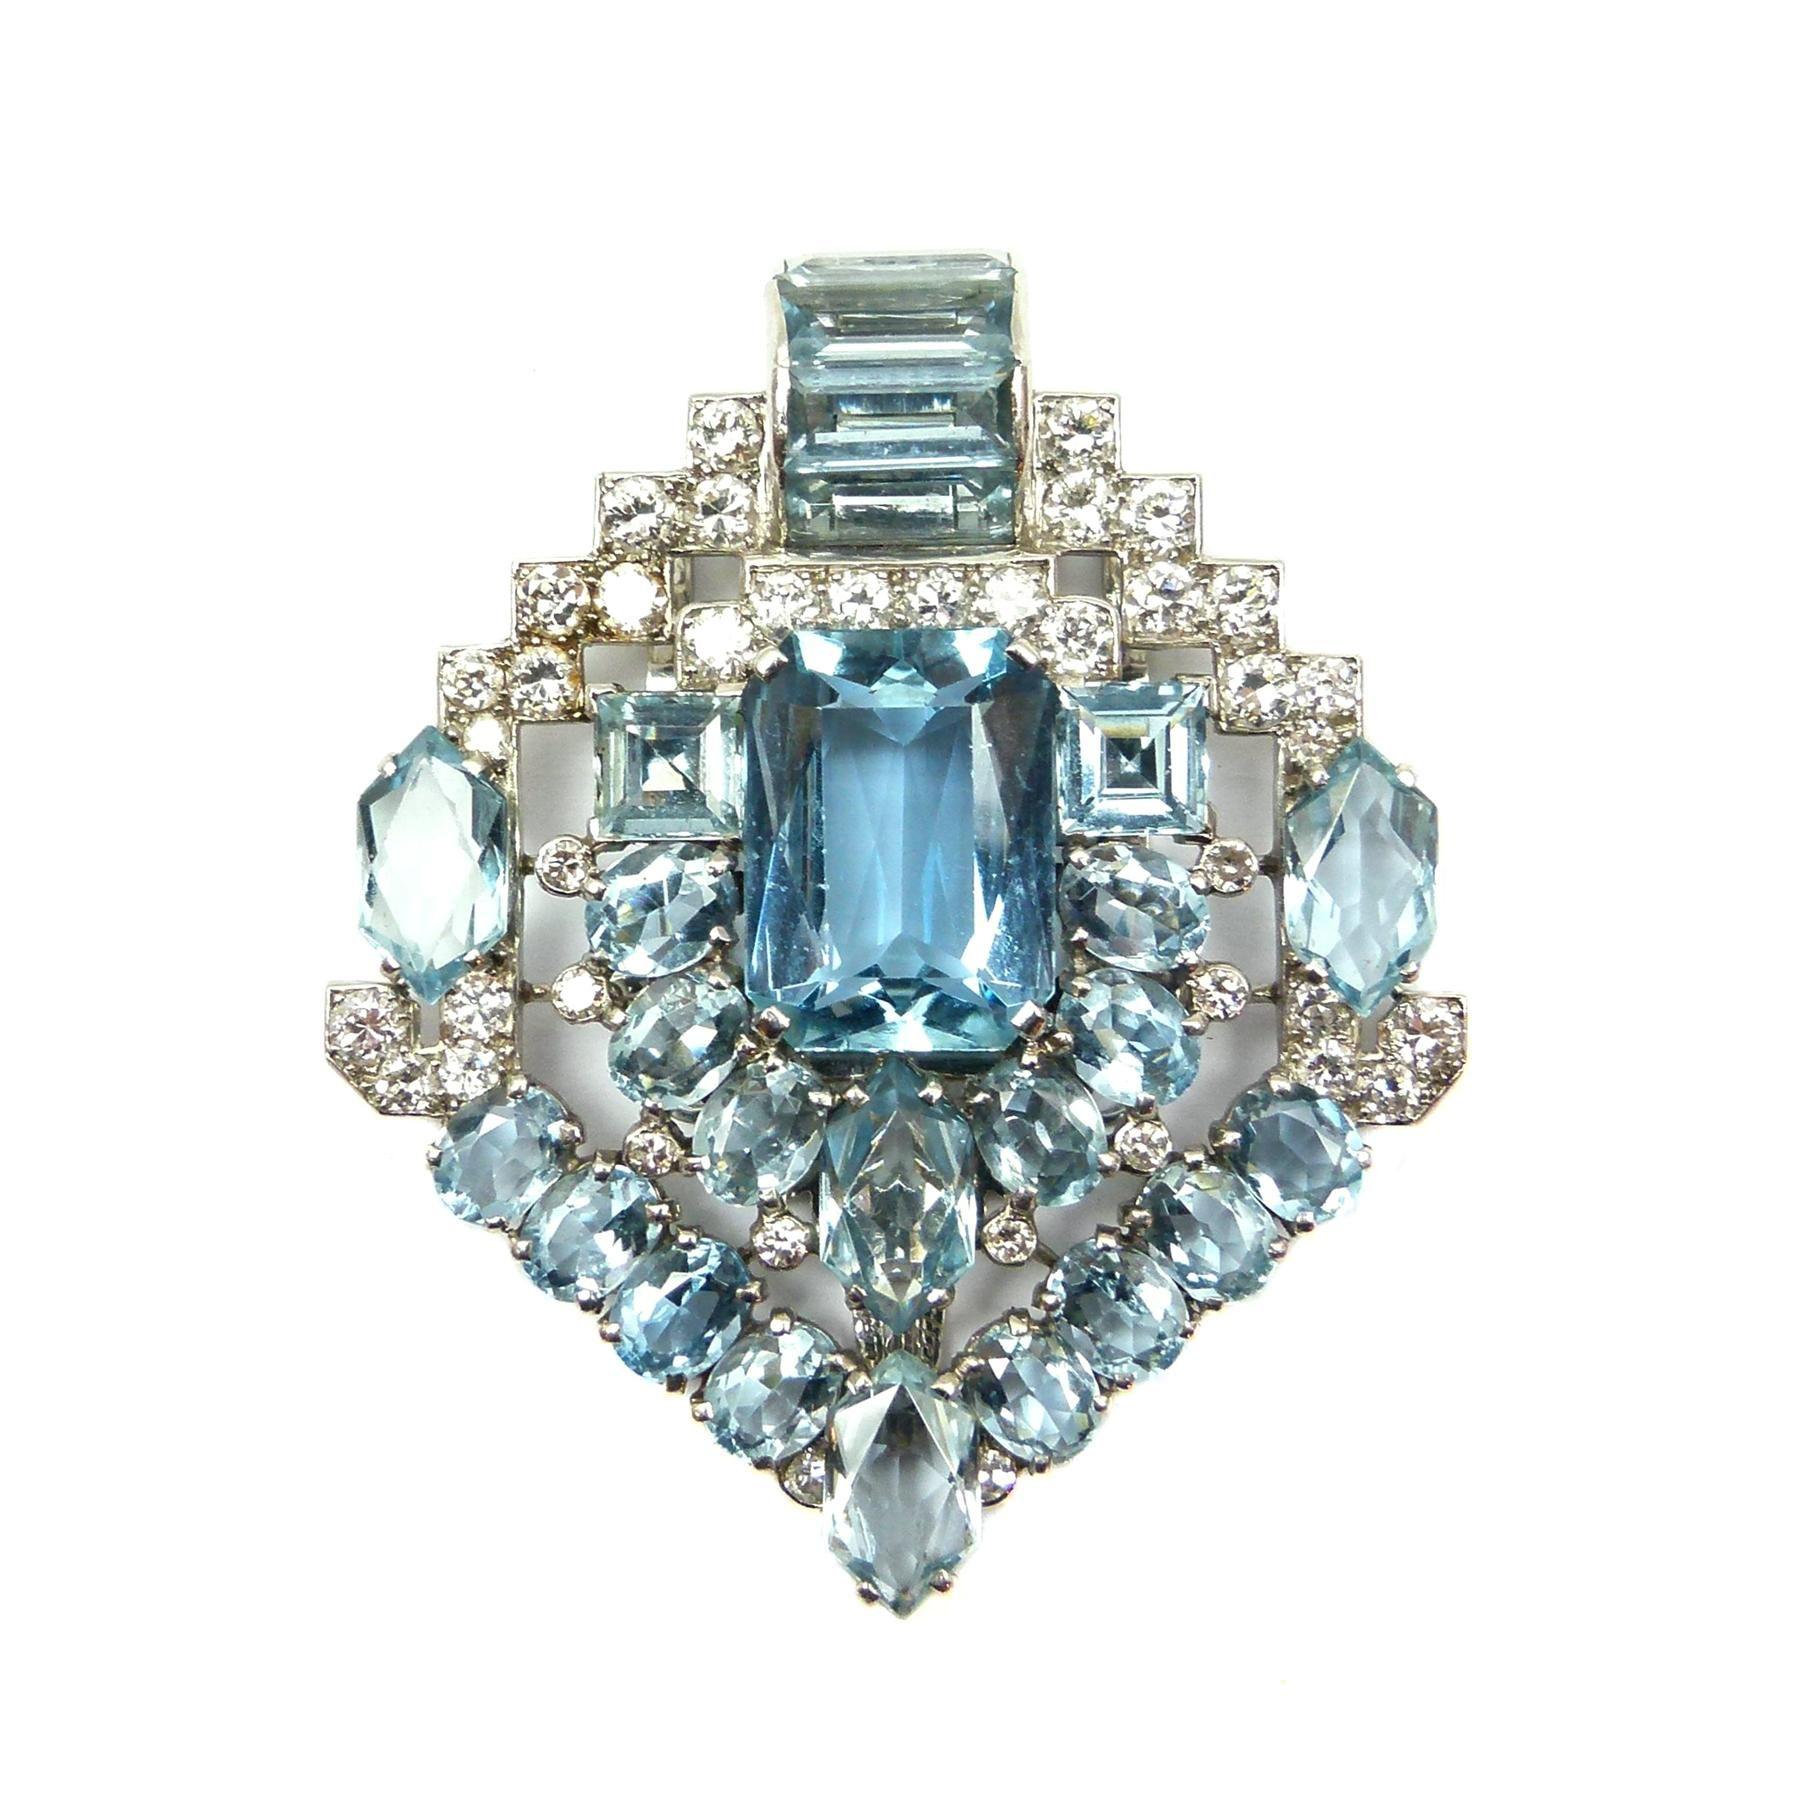 Art Deco aquamarine and diamond clip brooch by Cartier, London c.1935